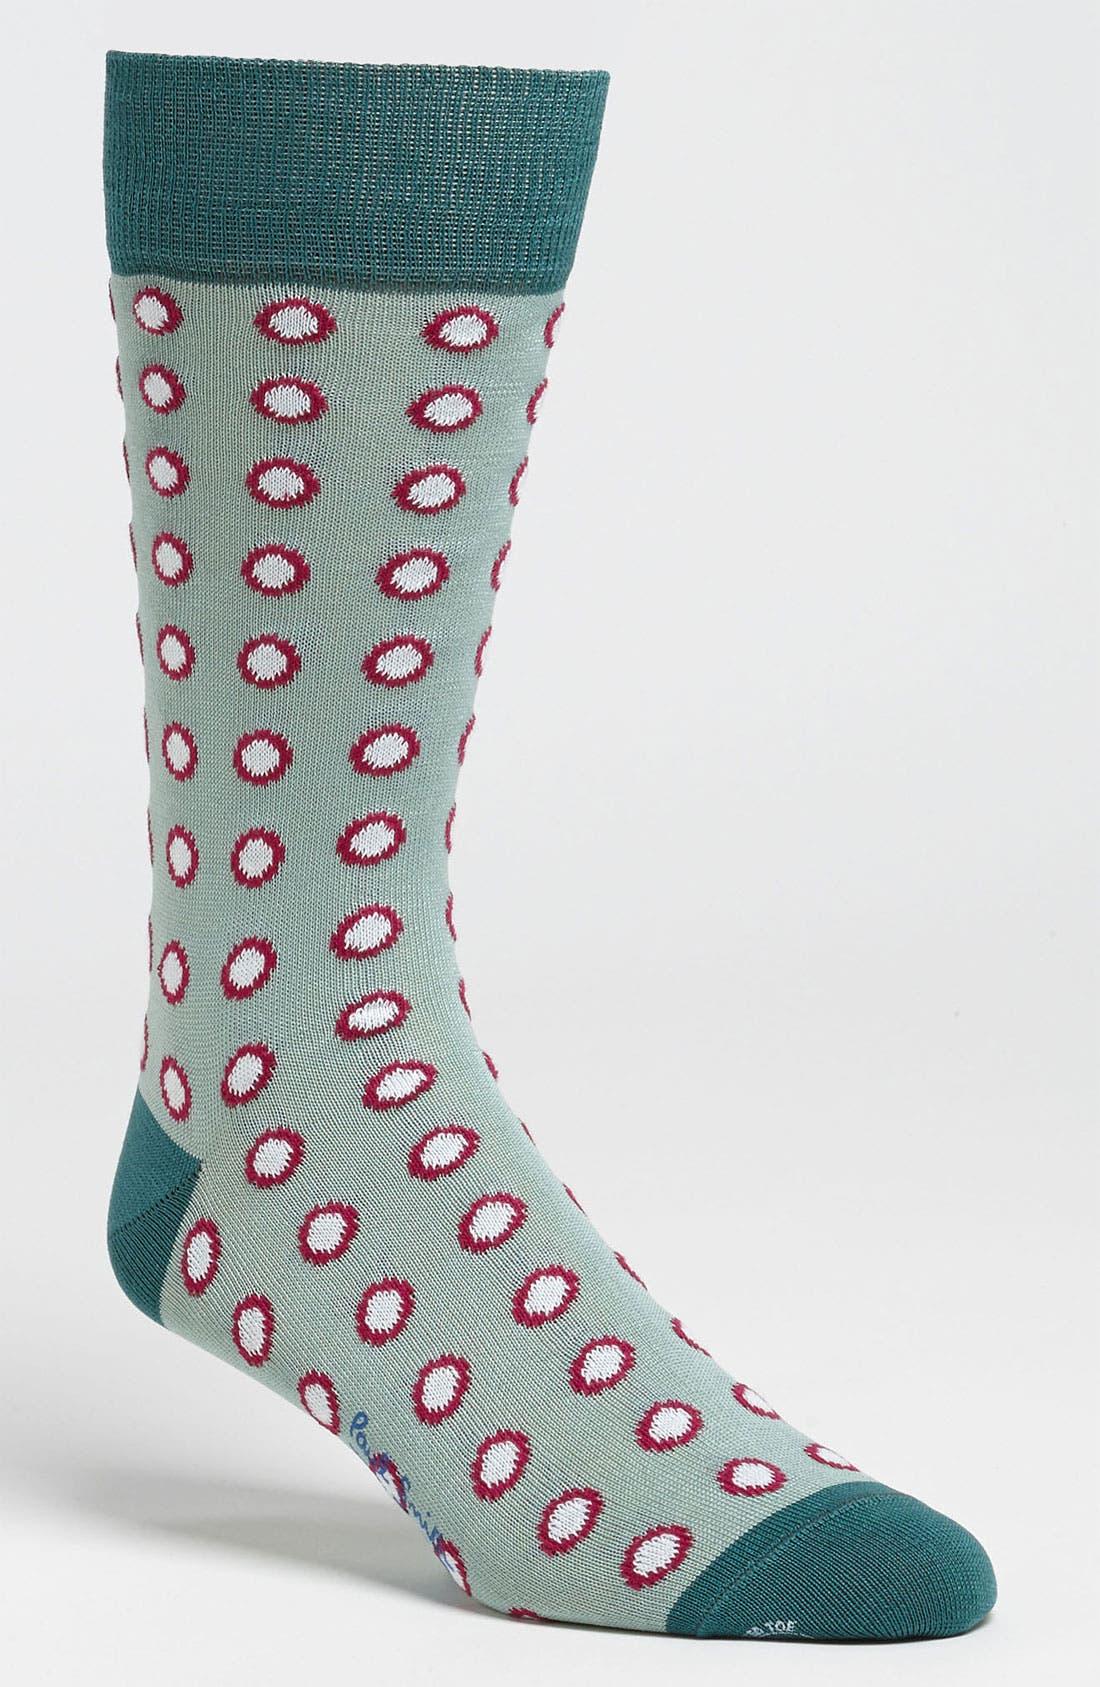 Main Image - Paul Smith Accessories 'London' Socks